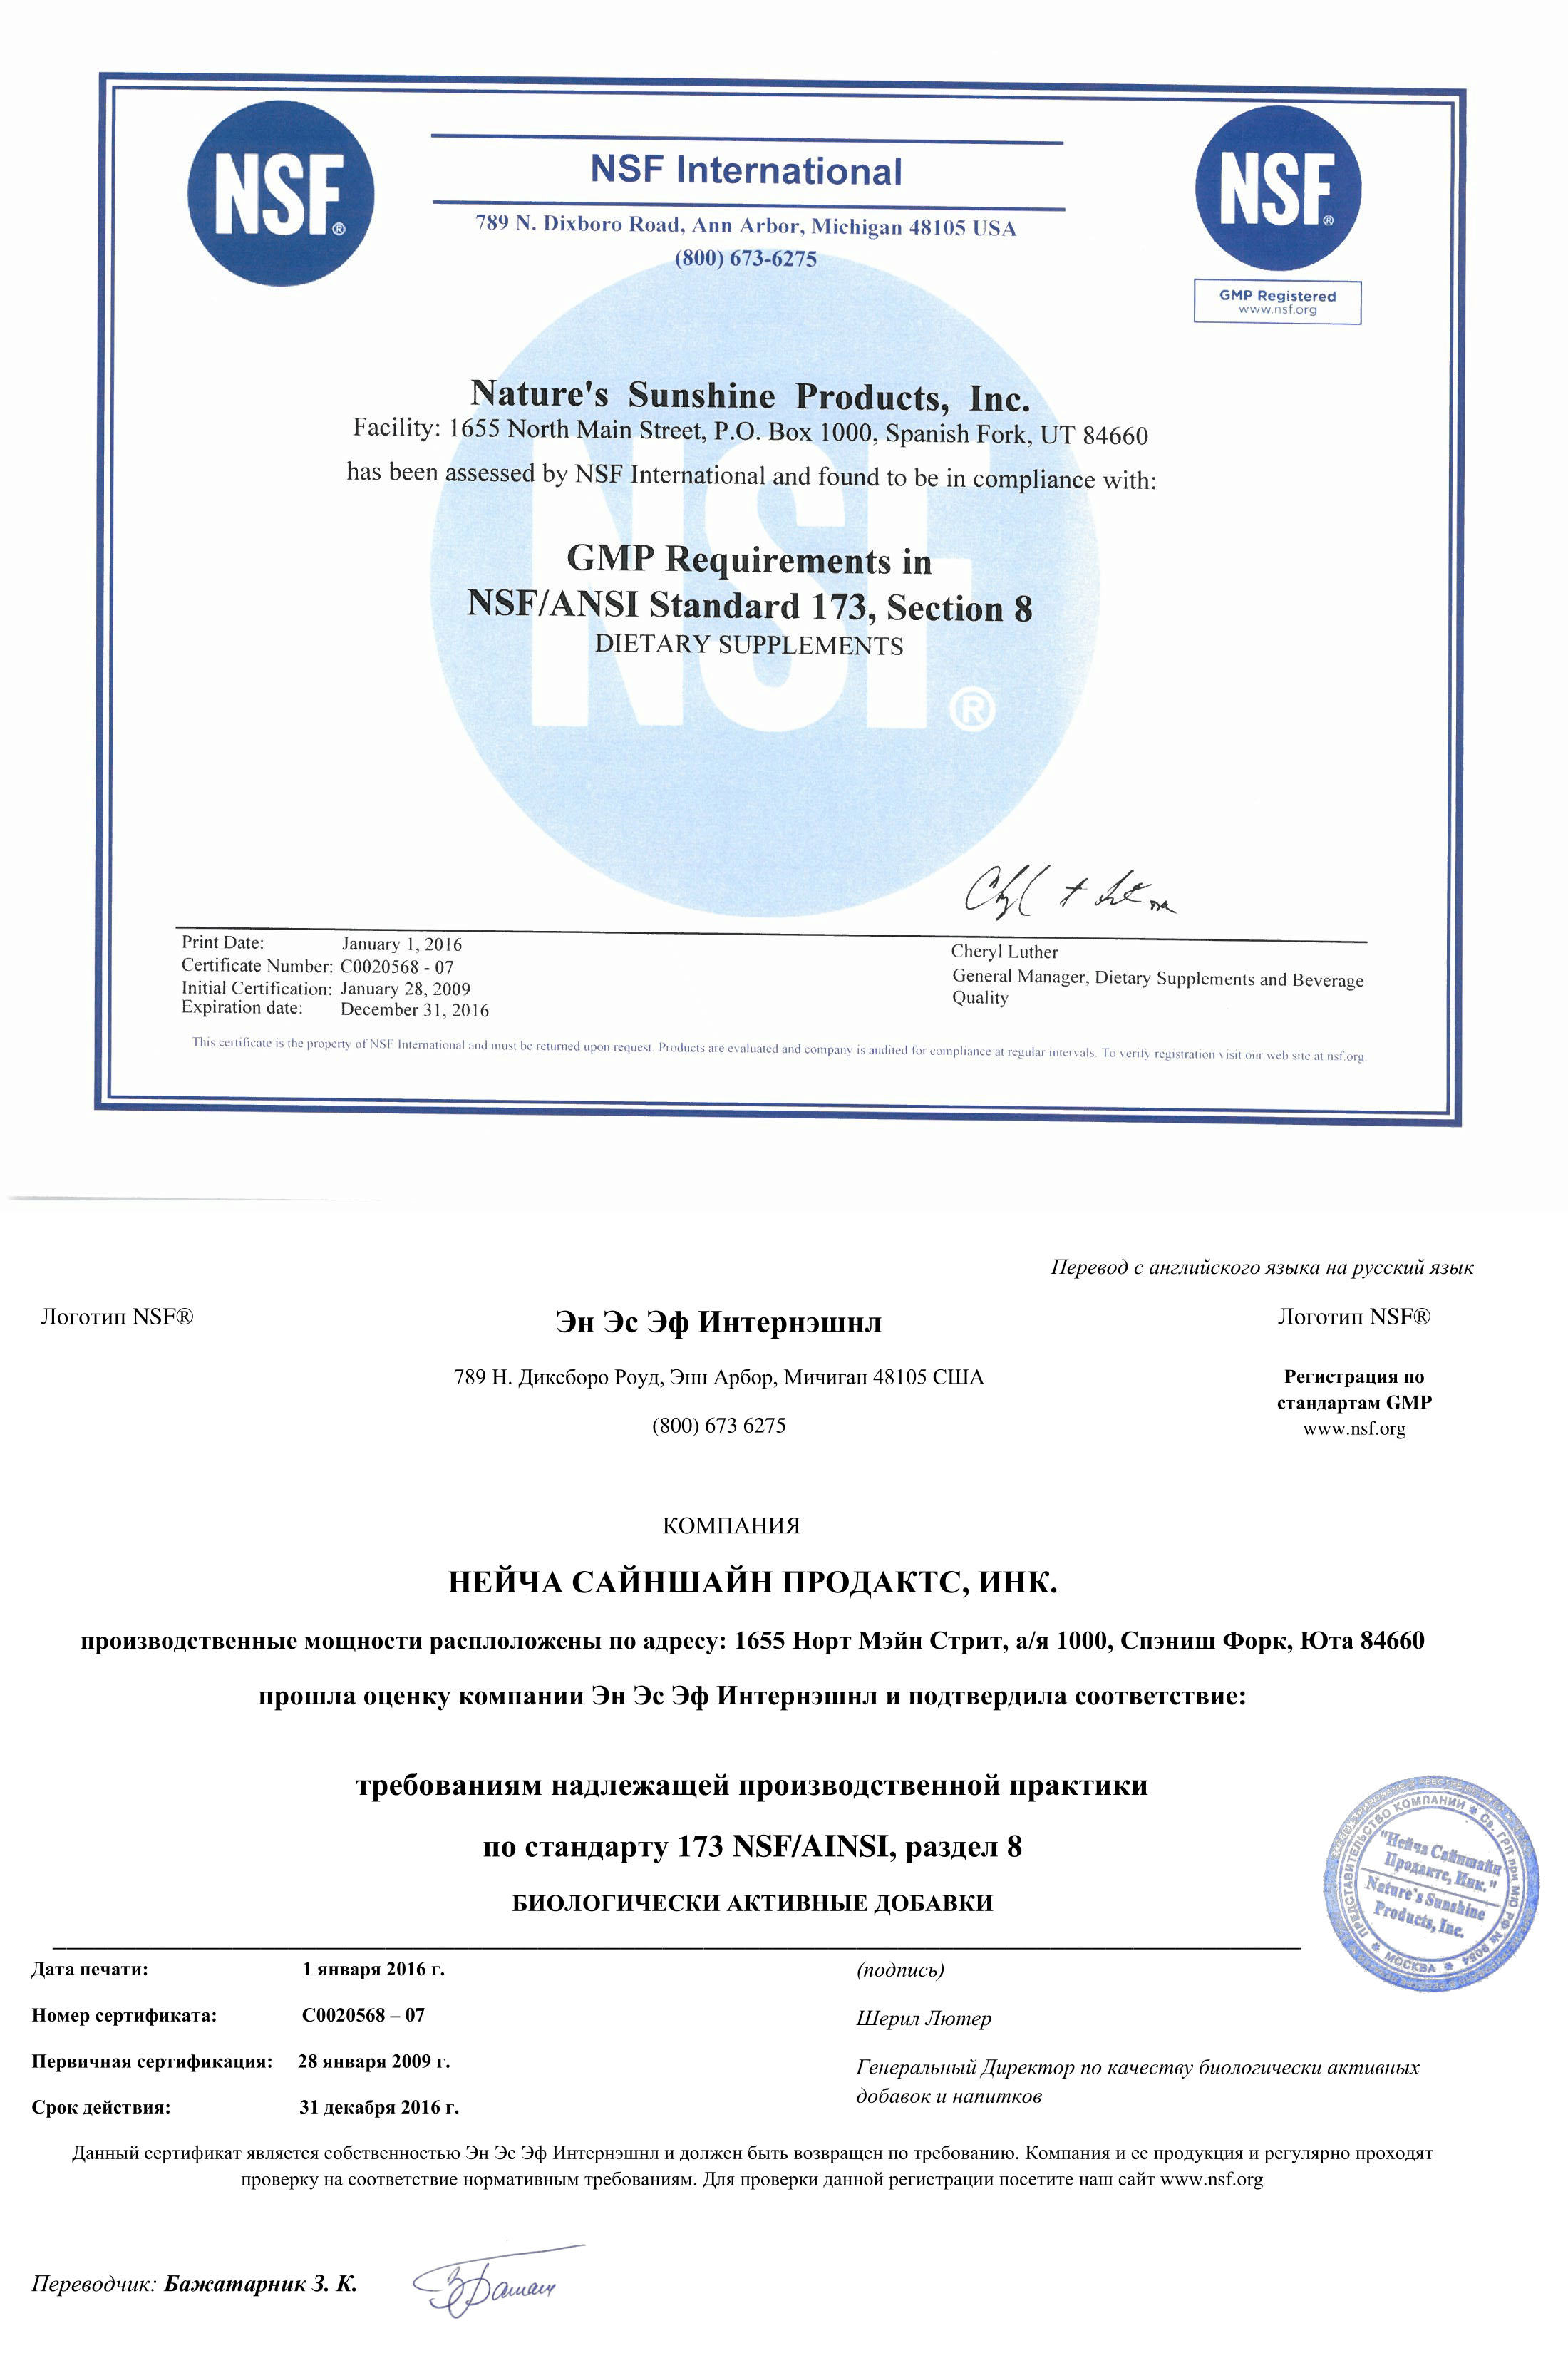 сертификат gmp нсп